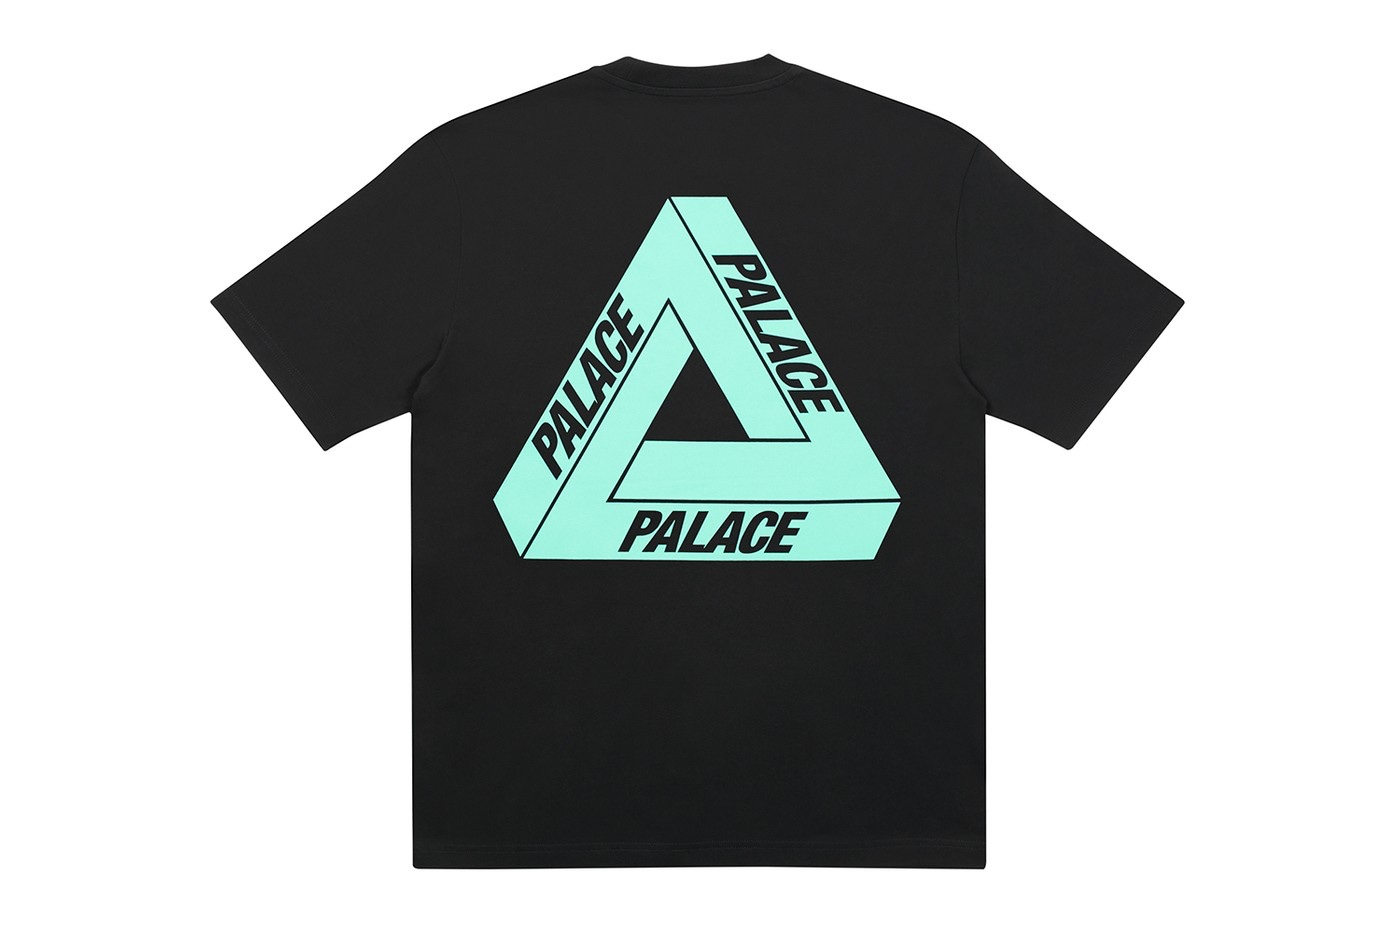 Palace T-Shirt Tri-To-Help